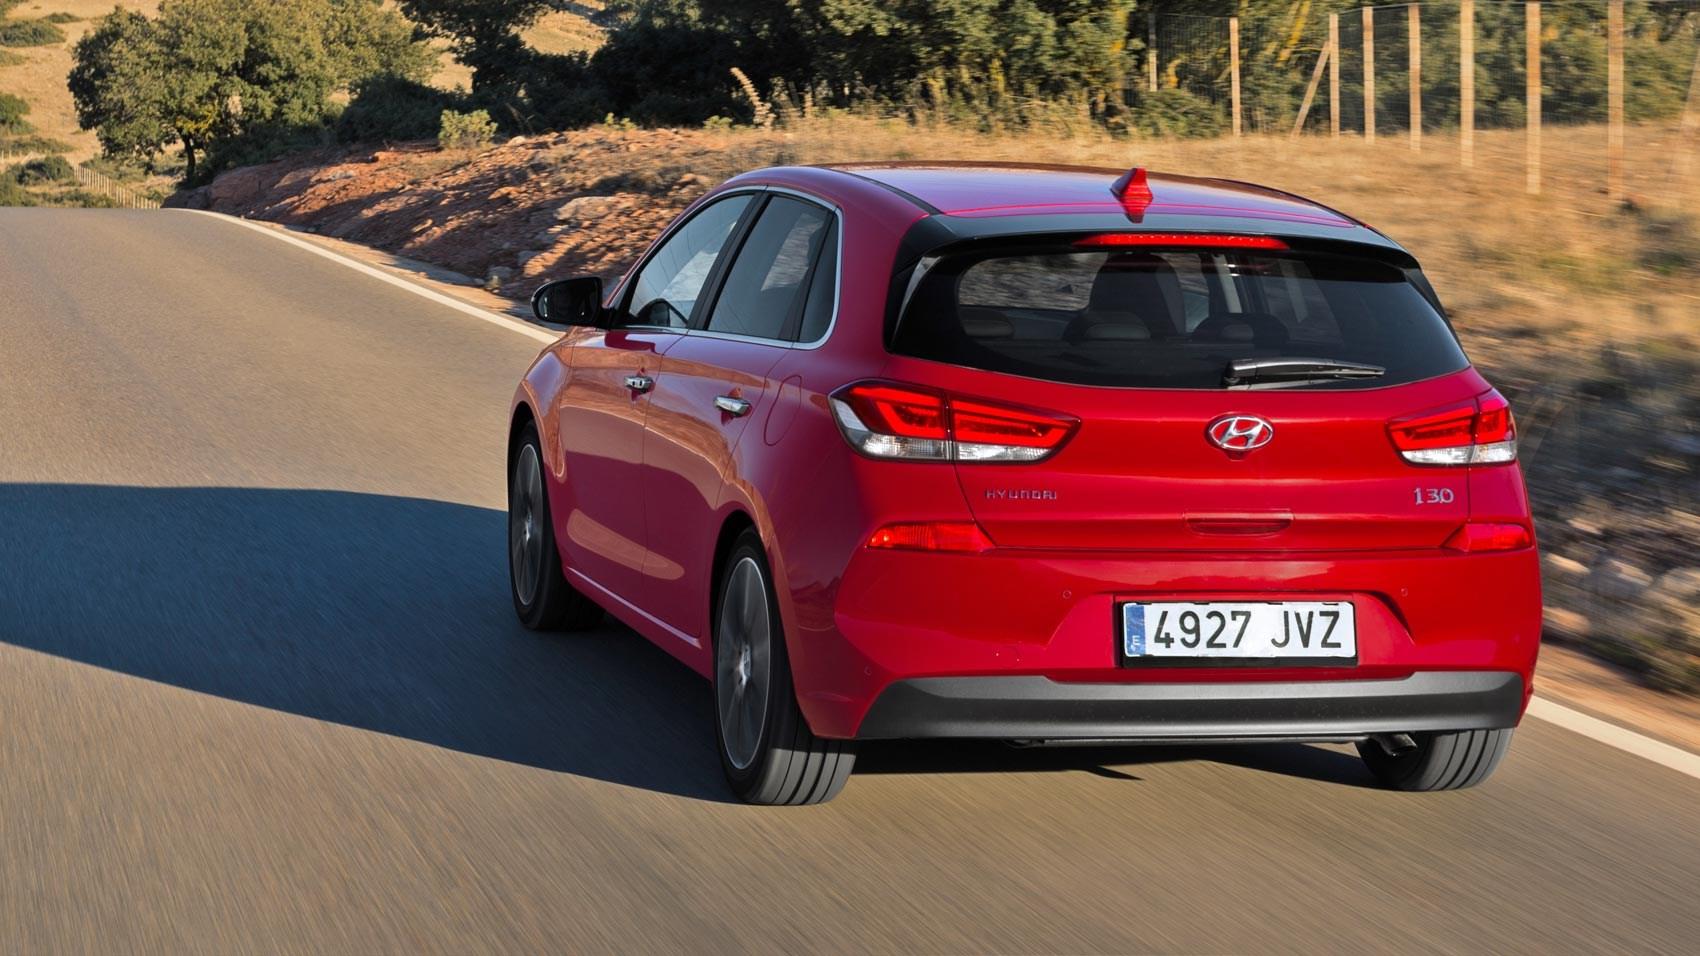 Amazing Hyundai I30 14 TGDi 140PS Premium 2017 Review By CAR Magazine